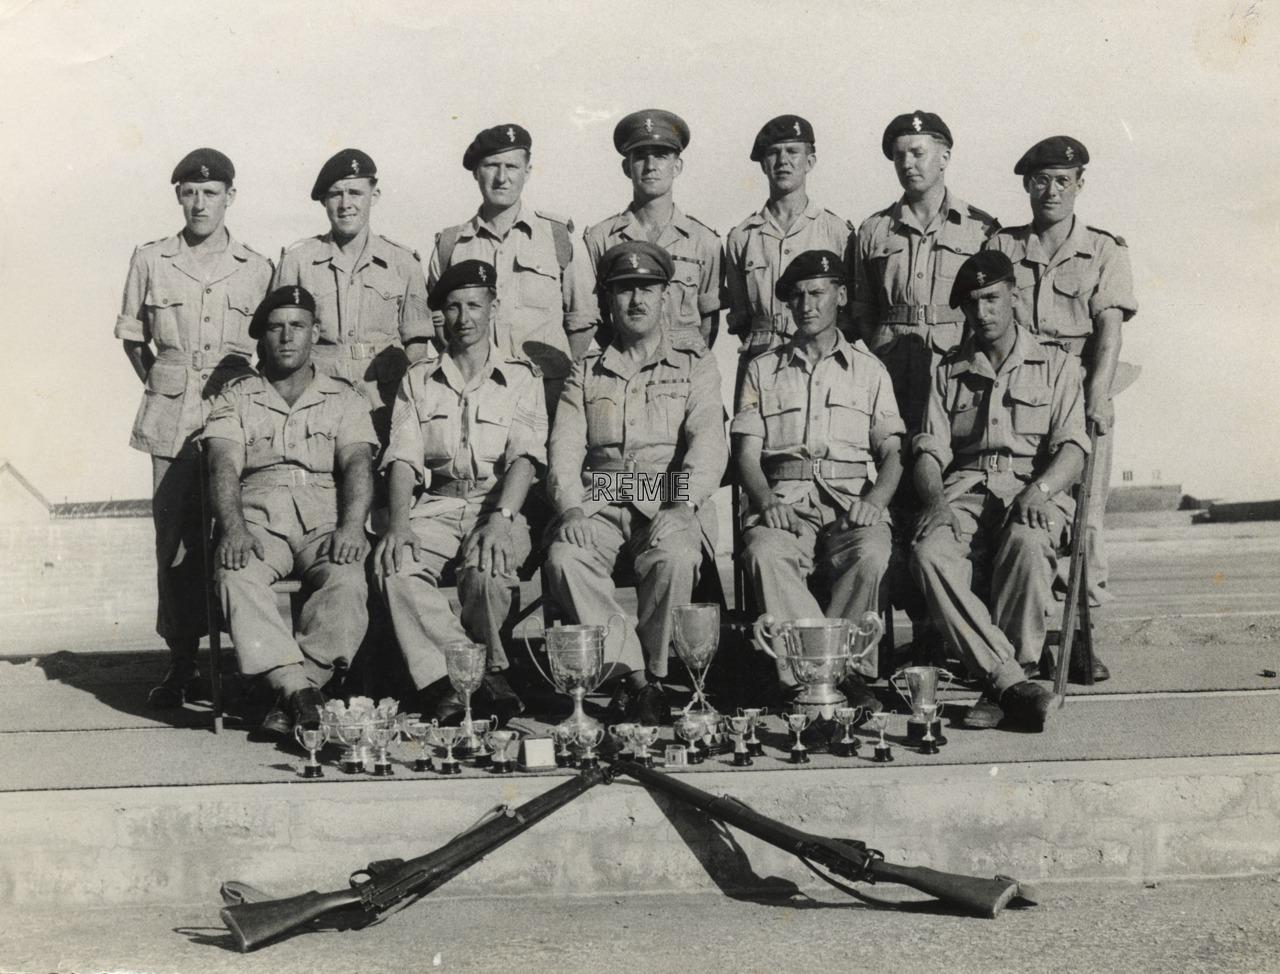 Gibraltar Command Rifle Meeting, Garrison Workshop REME, September 1952